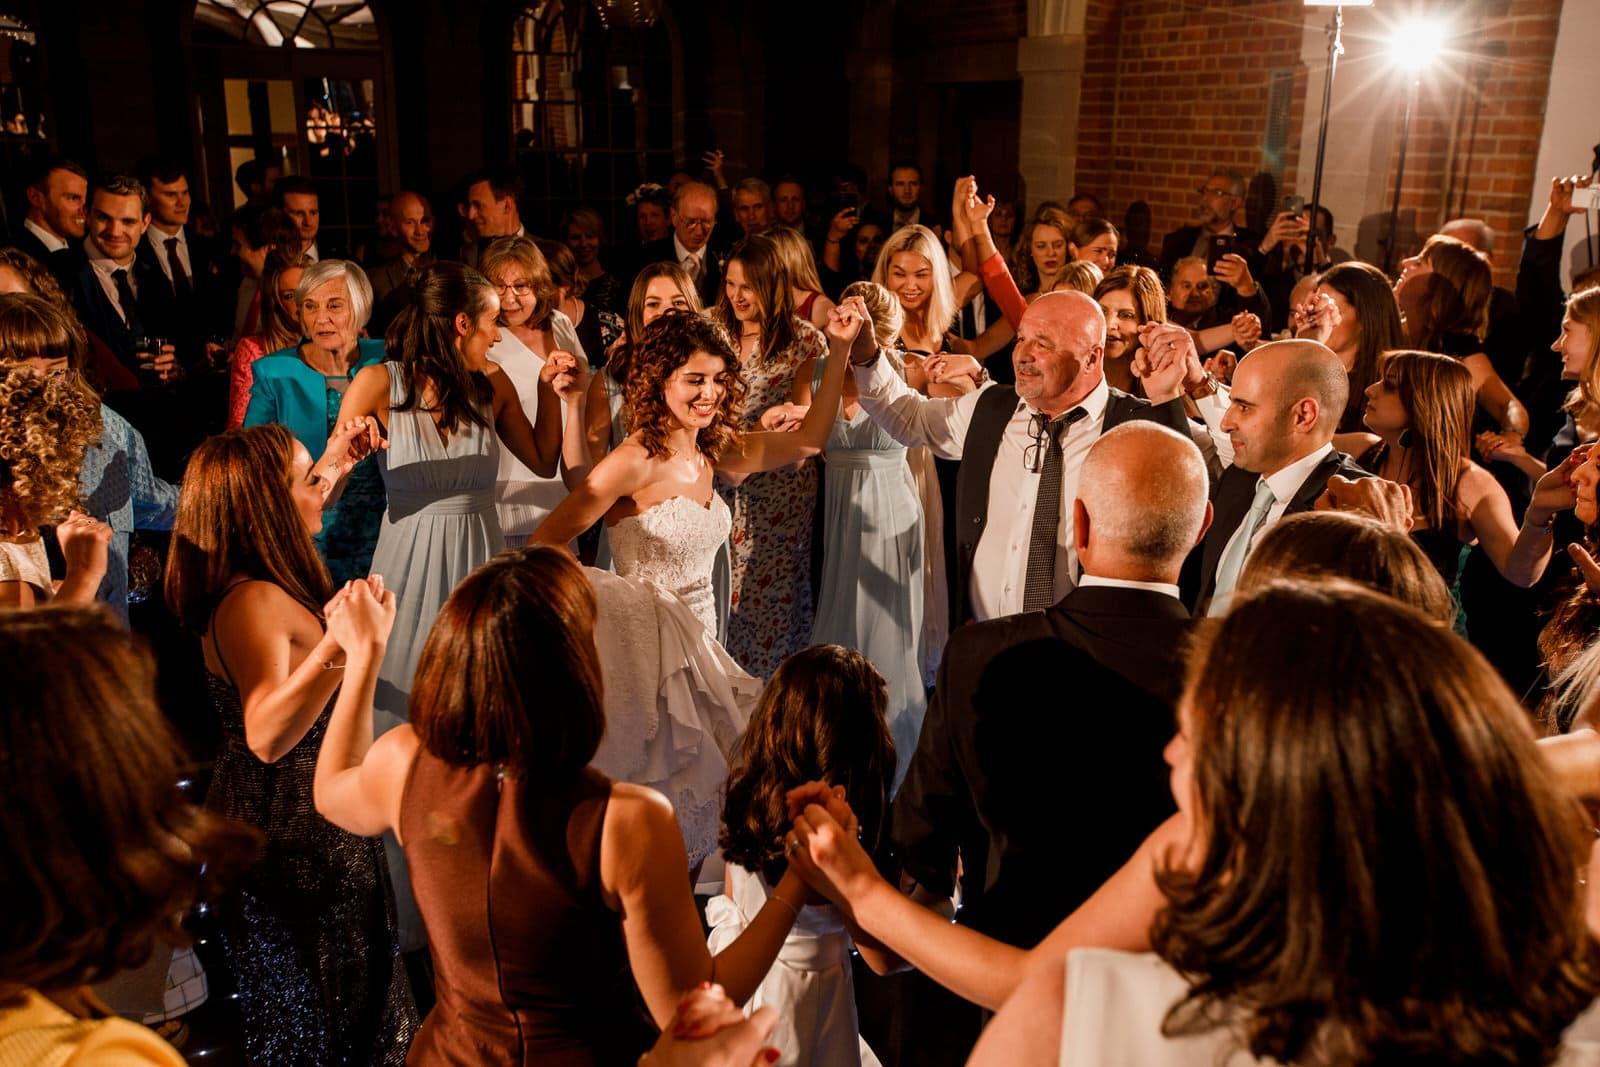 greek dancing at wedding